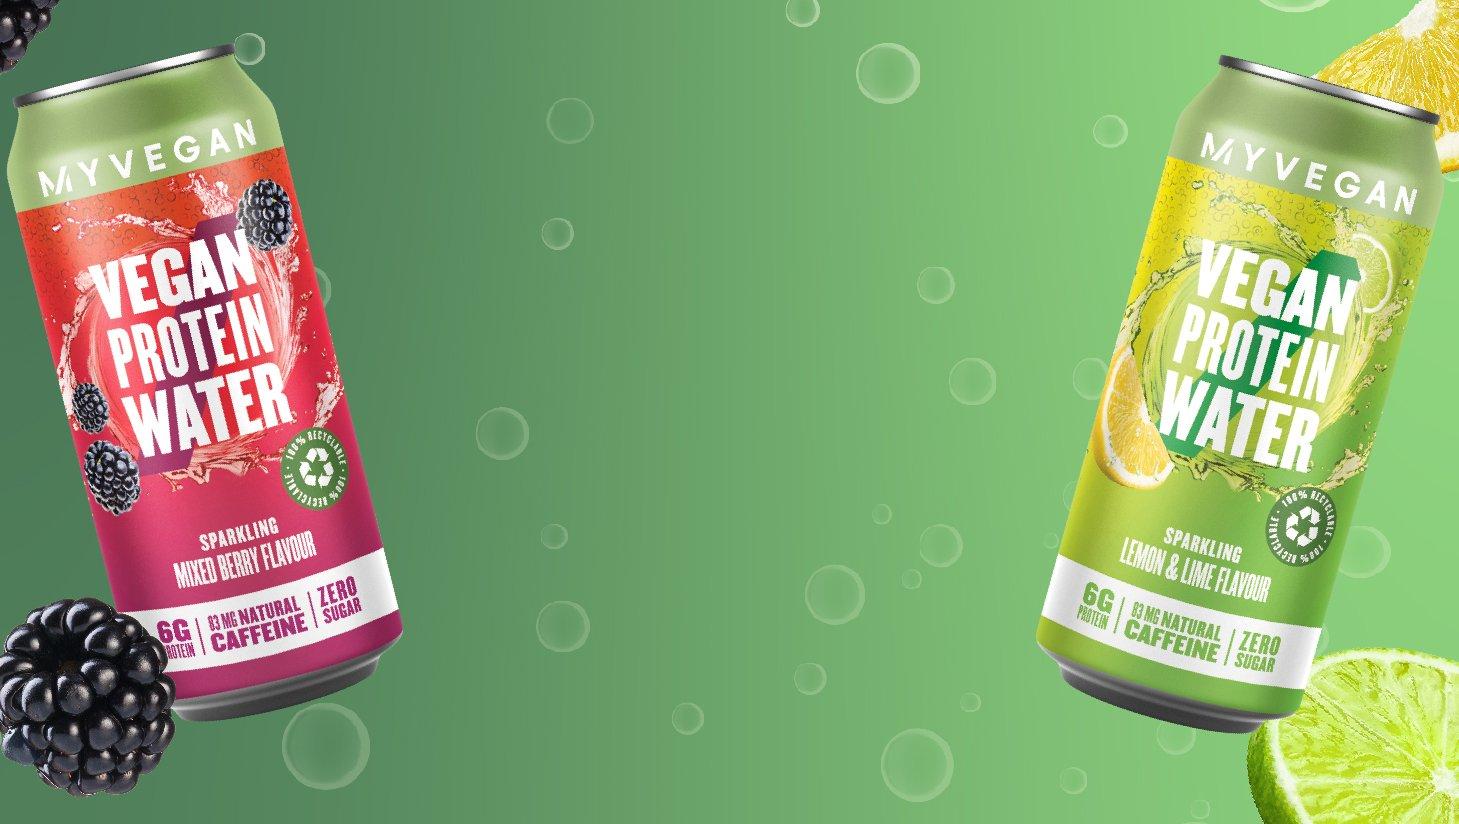 Sparkling Vegan Protein Water | Myvegan